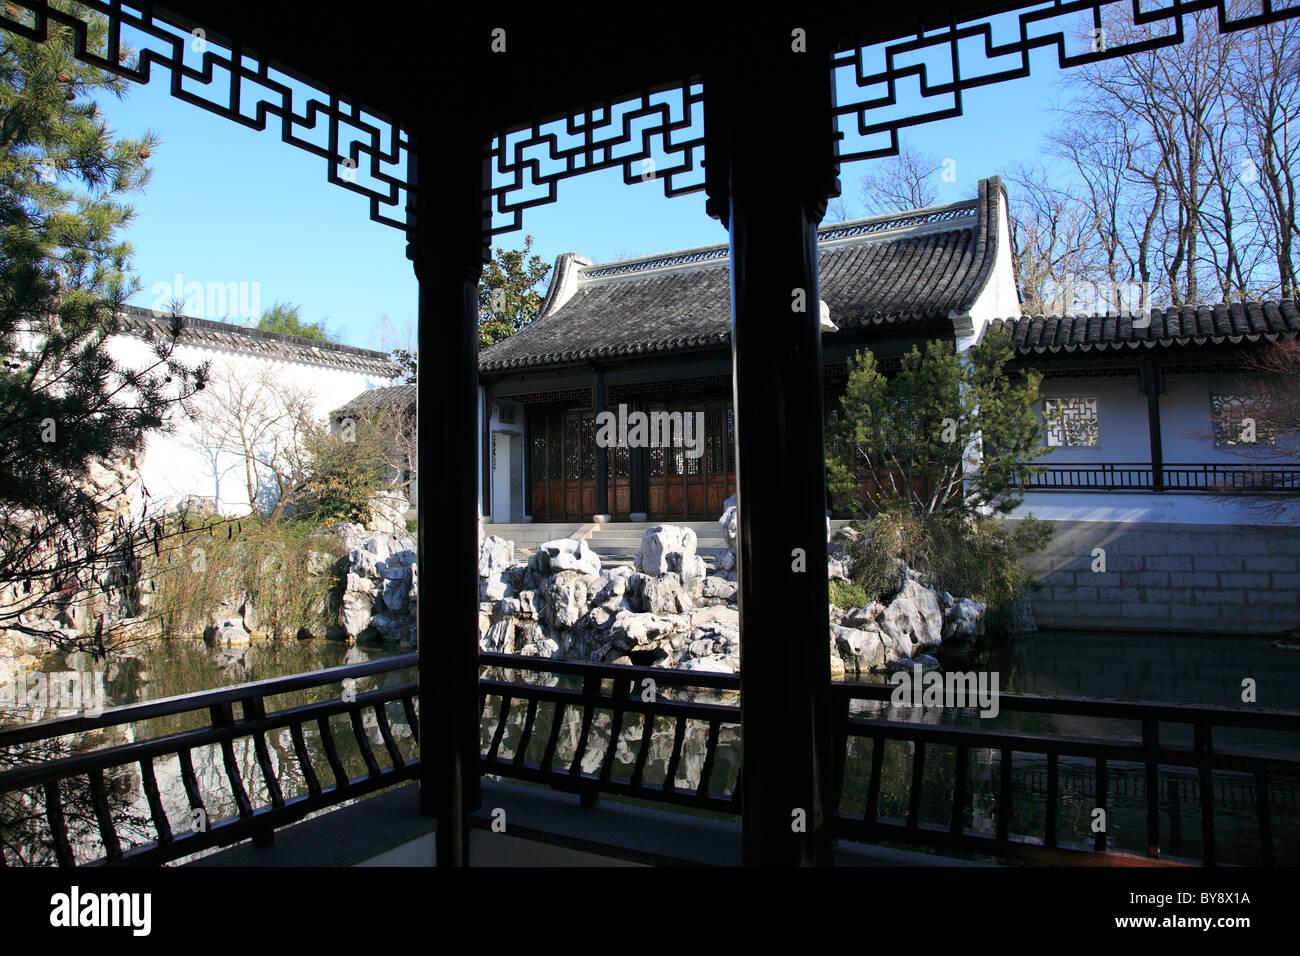 Chinese Scholar's Garden, Snug Harbor Cultural Center and Botanical Garden, Richmond Terrace, Staten Island, New - Stock Image